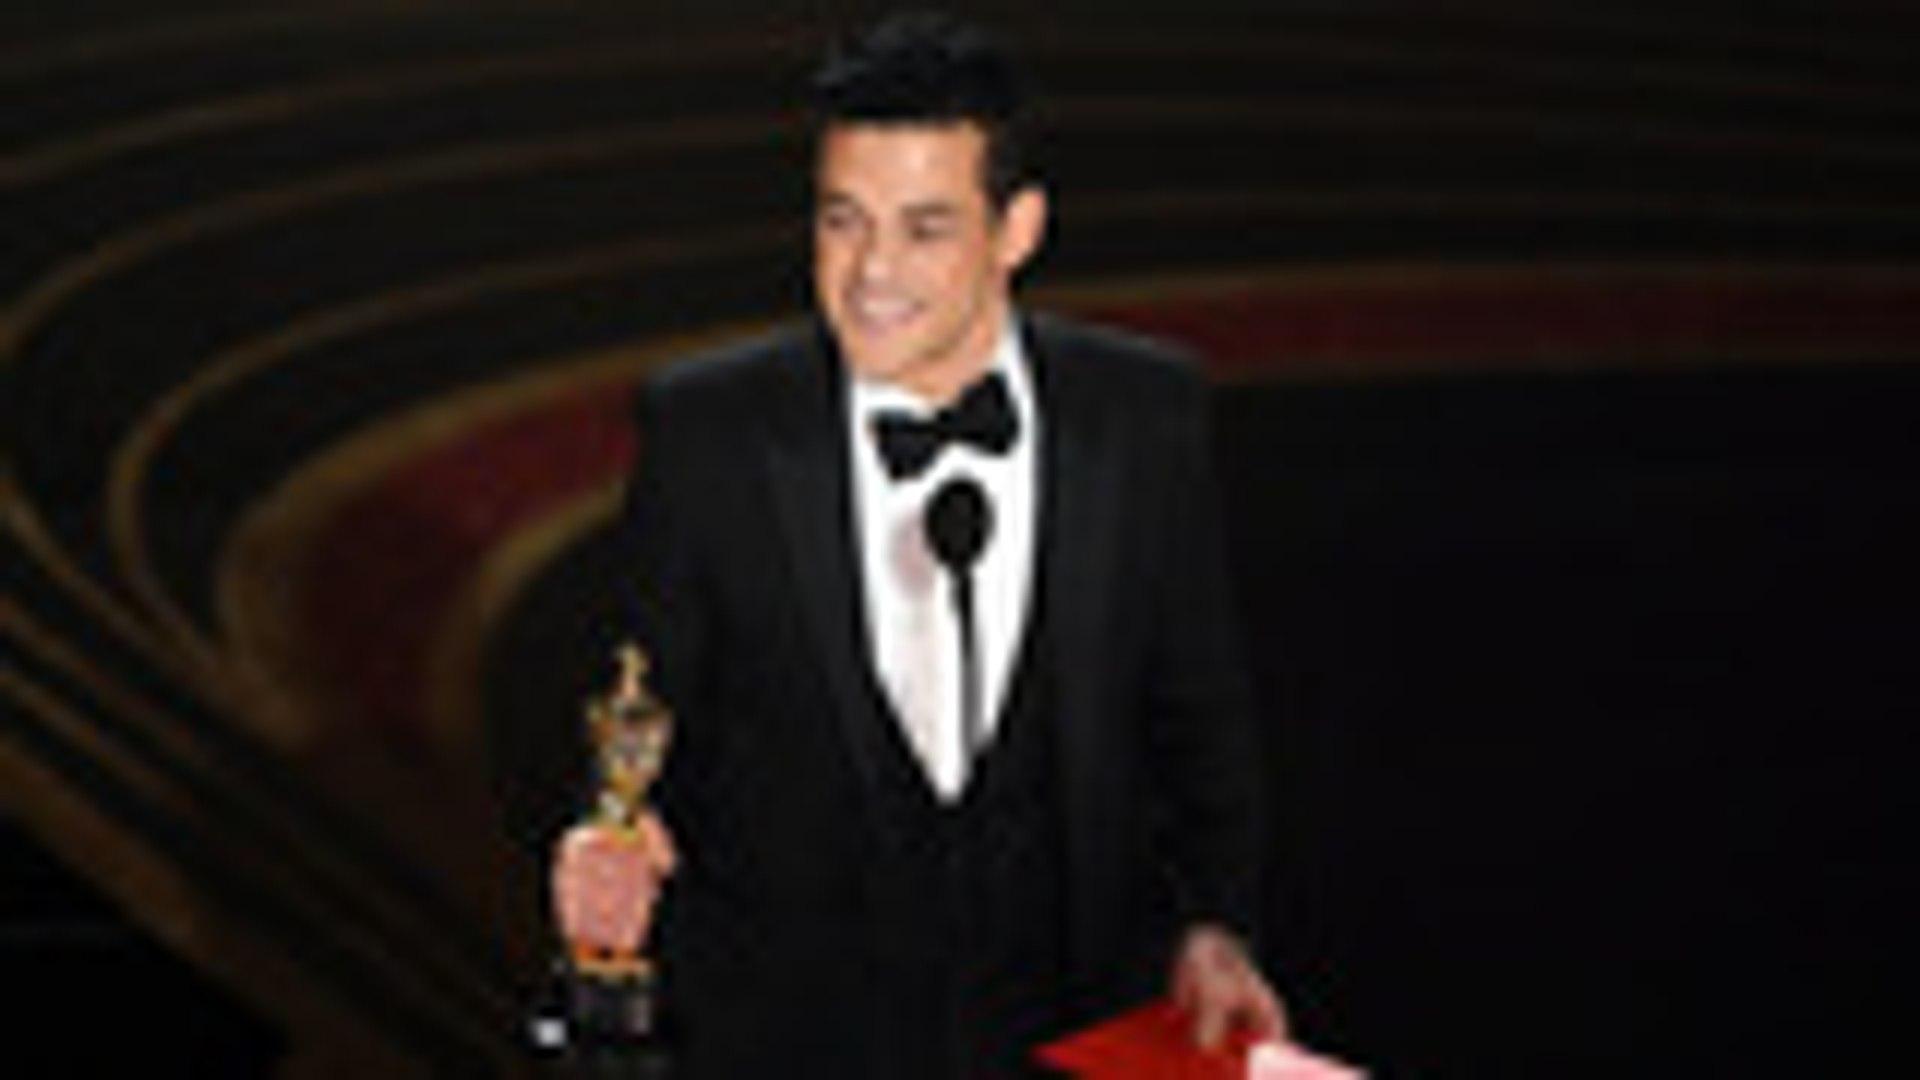 Rami Malek Takes Home Best Actor Oscar For His Role in 'Bohemian Rhapsody' | Billboard New